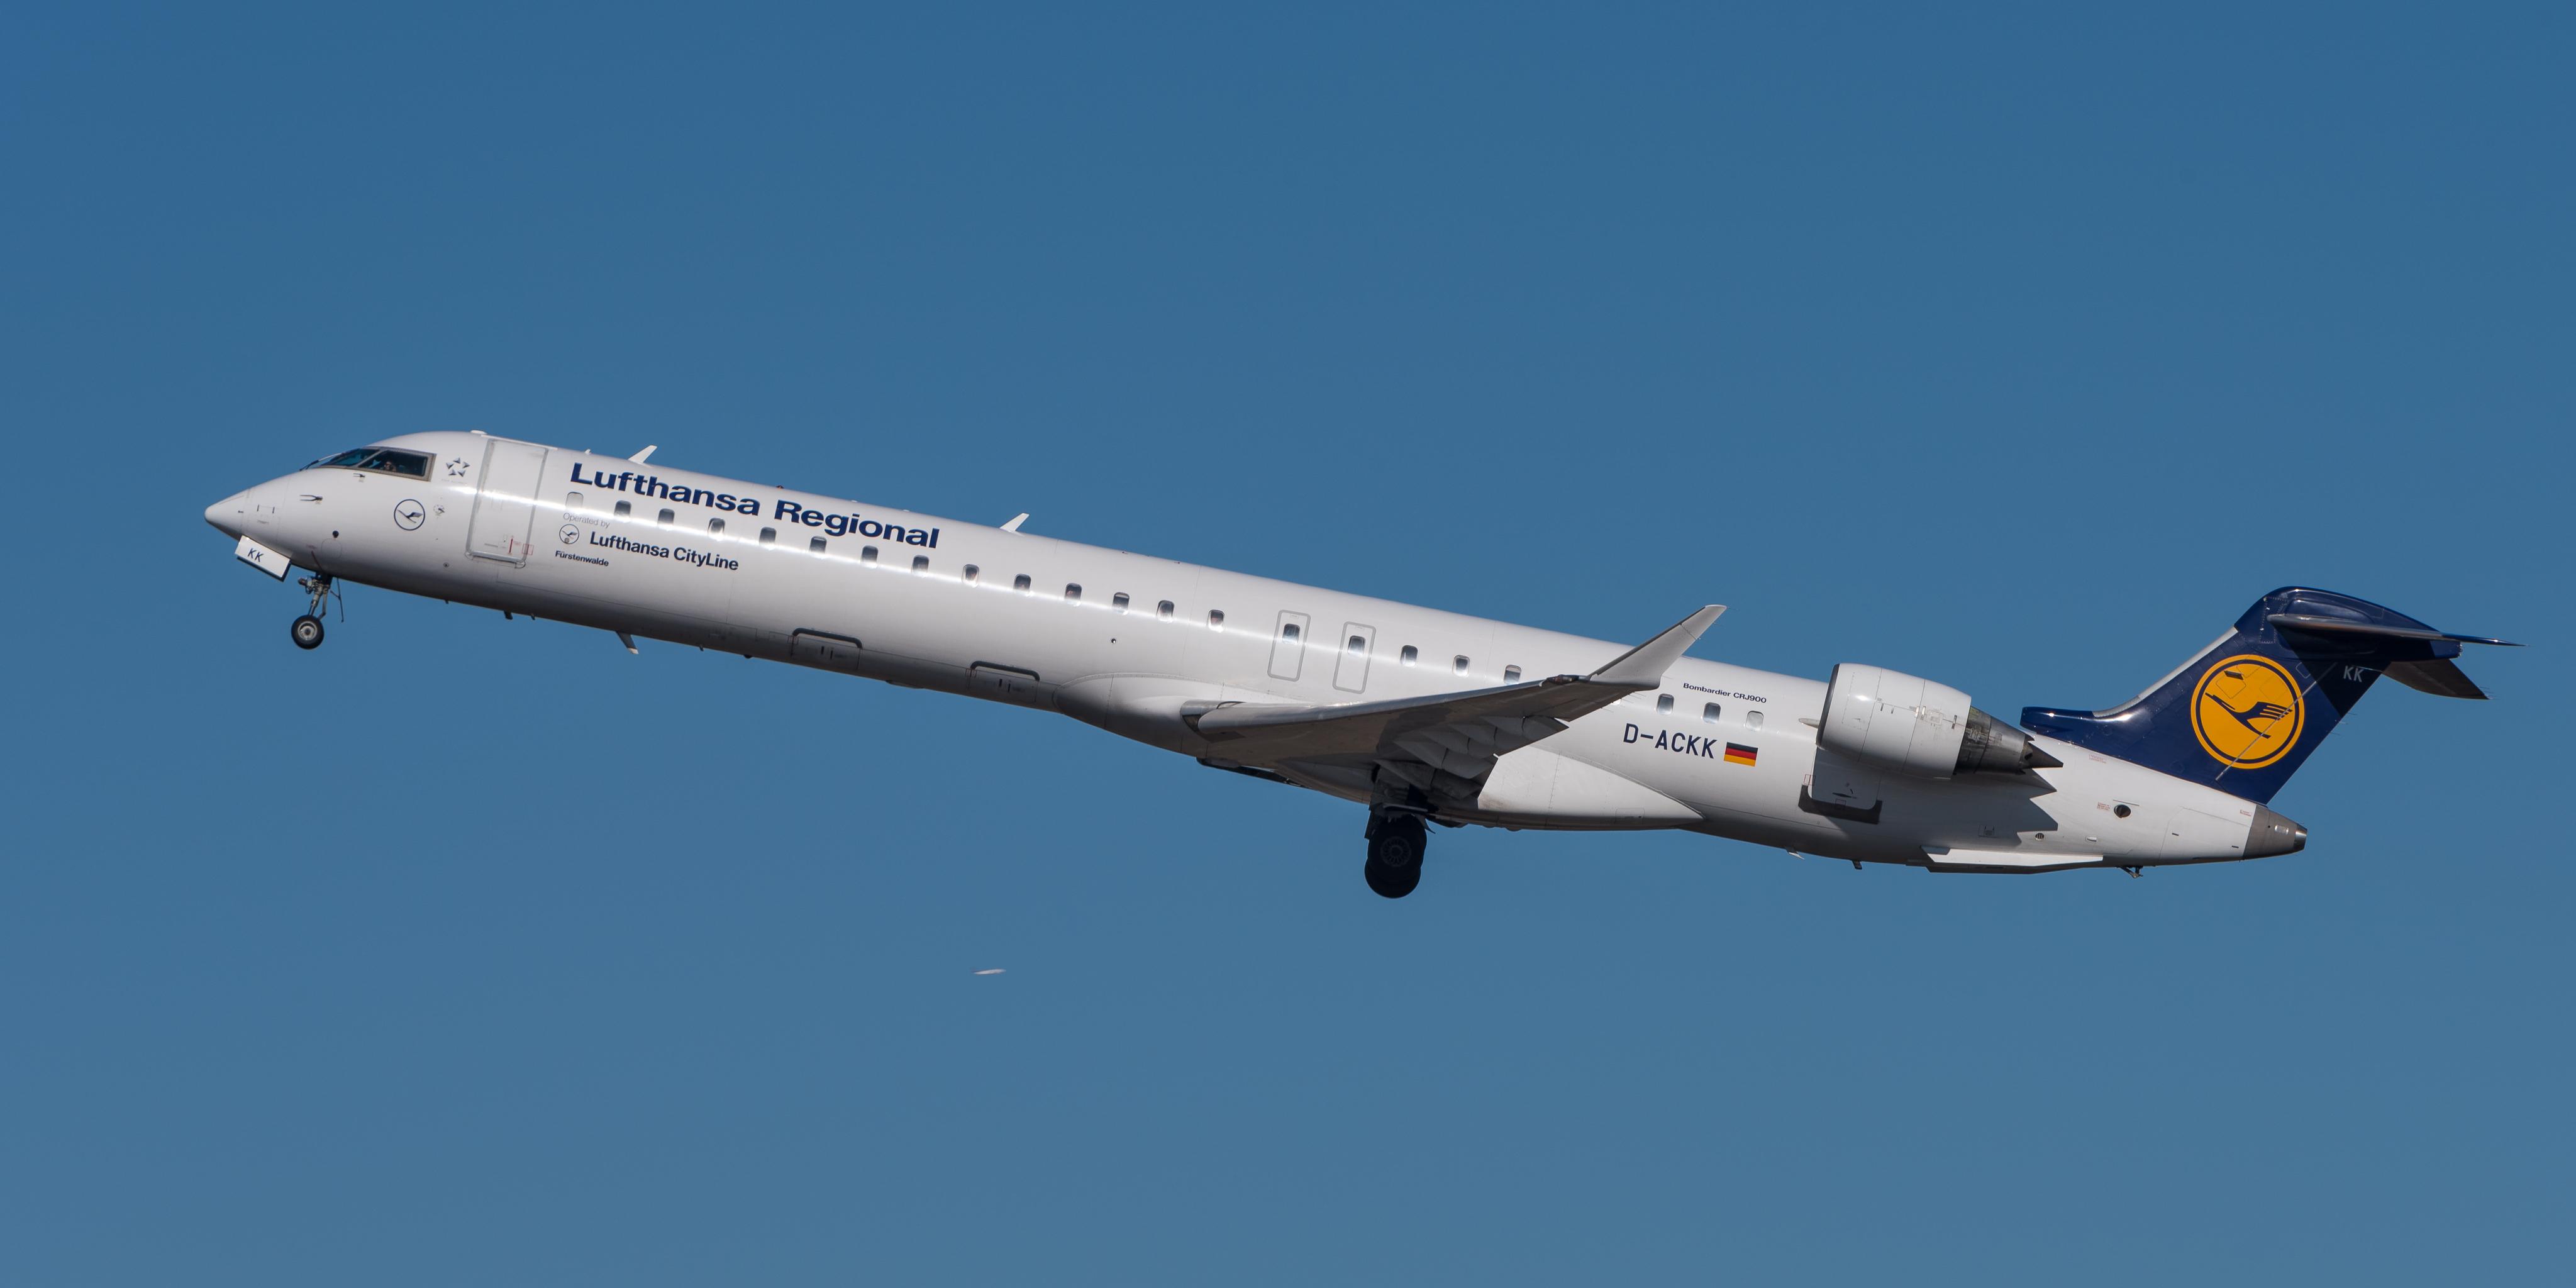 File:Lufthansa Regional Bombardier CRJ-900LR D-ACKK MUC 2015 01.jpg